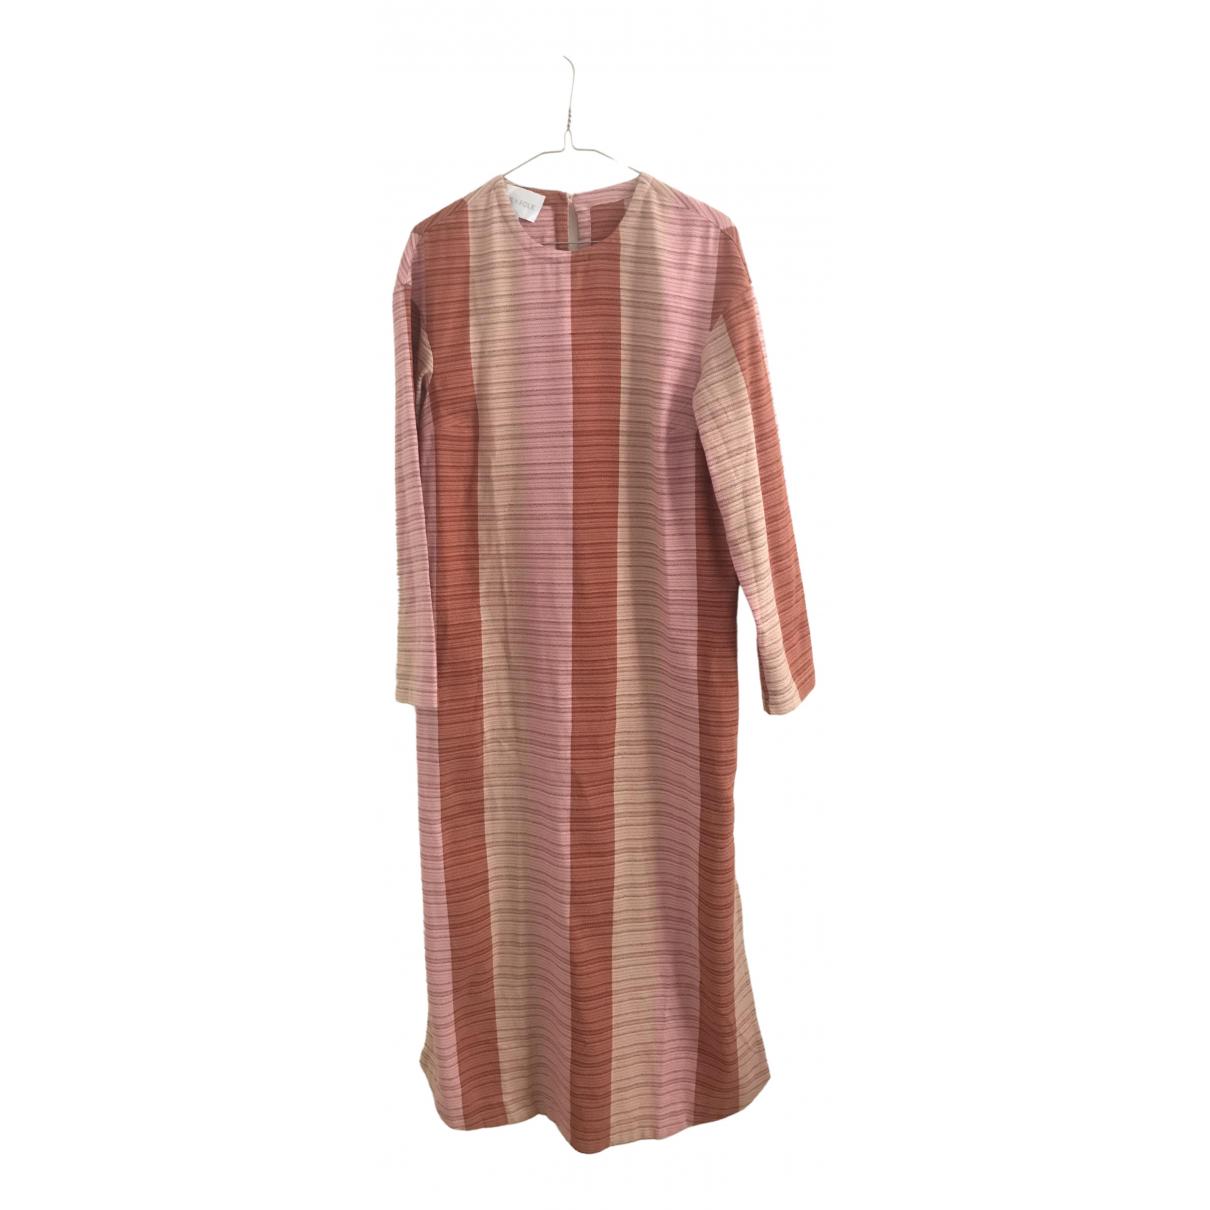 Lucy Folk \N Kleid in  Bunt Baumwolle